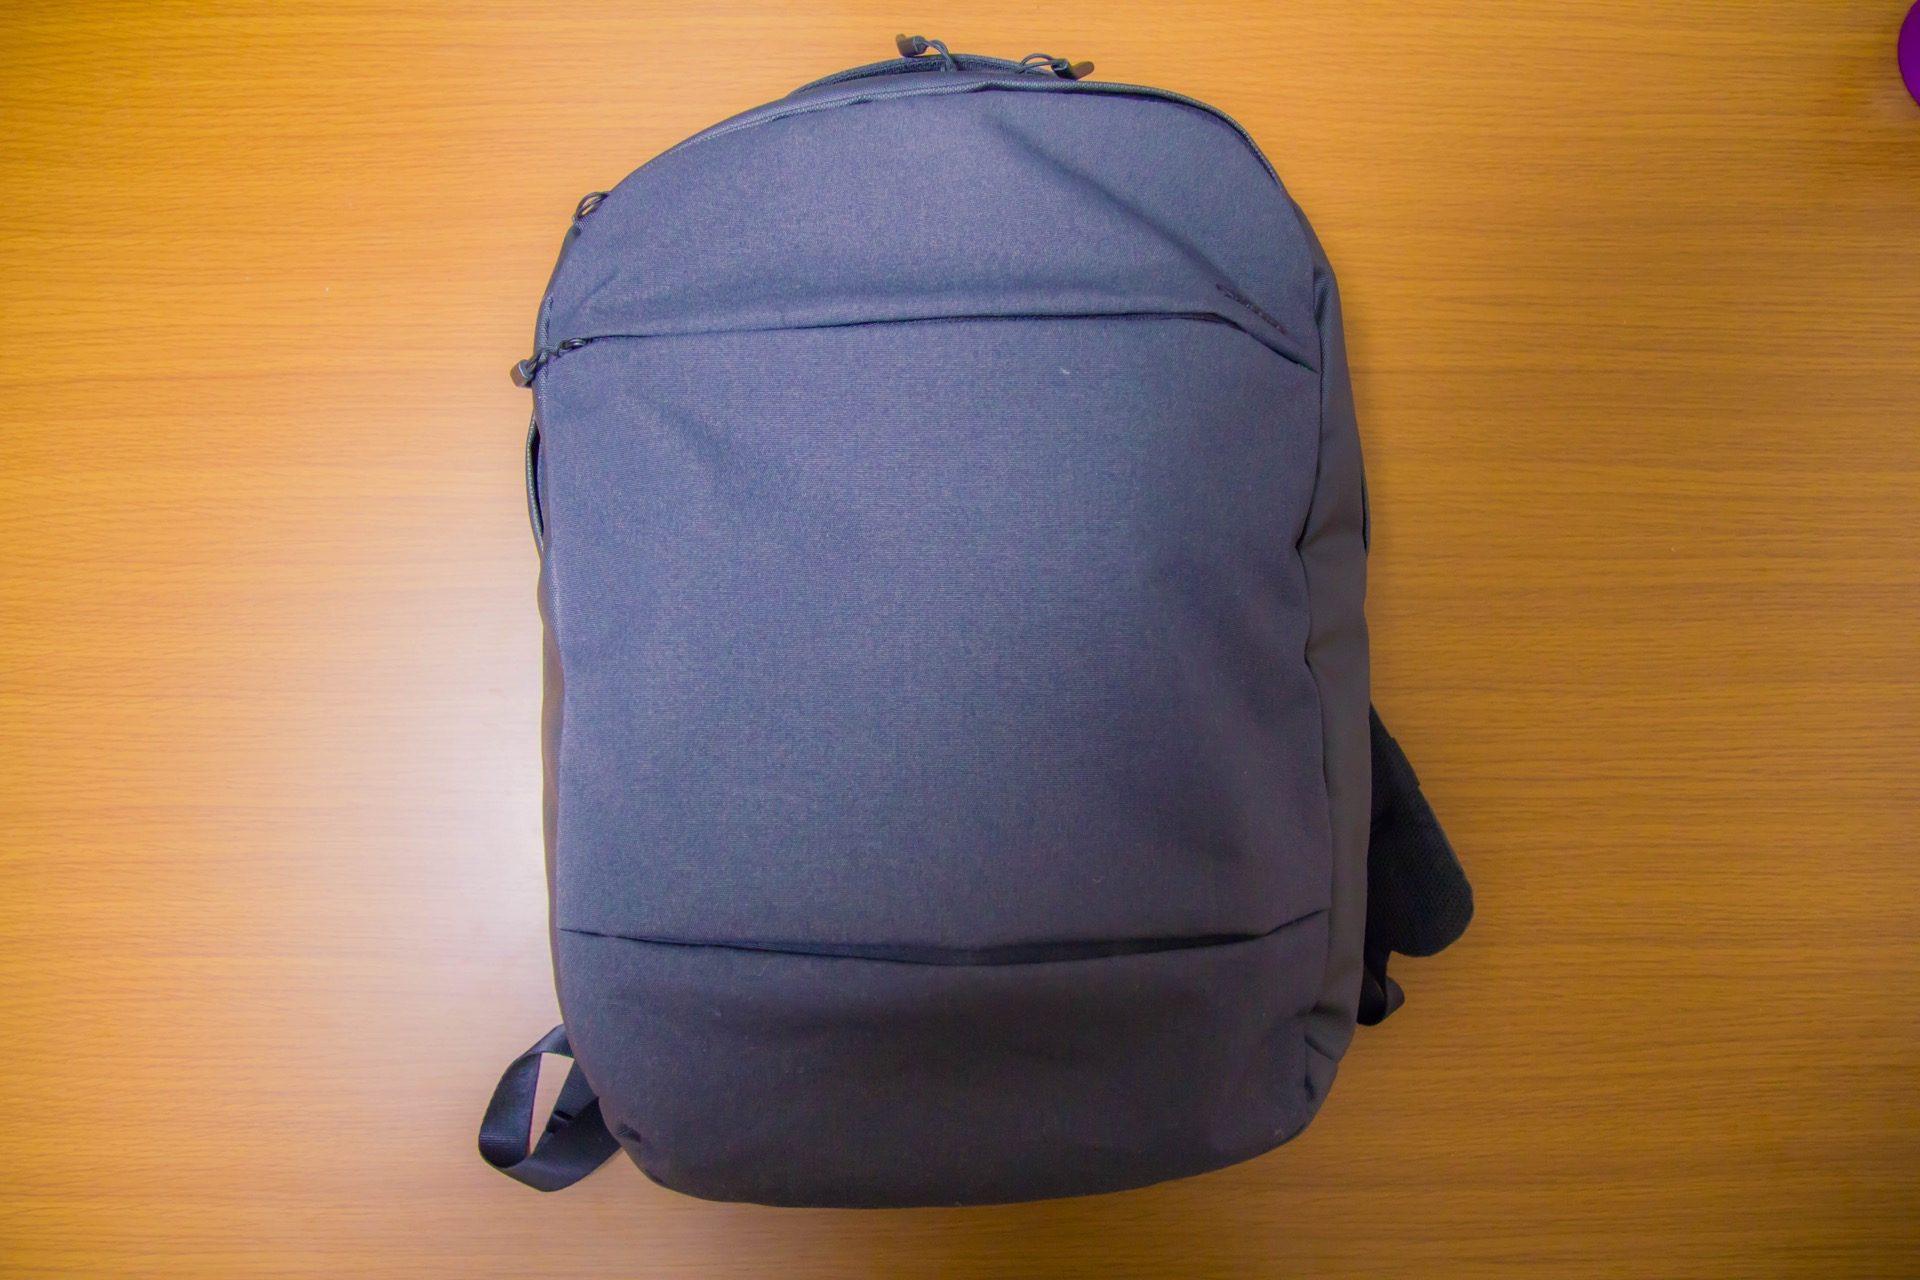 incase-backpack-19